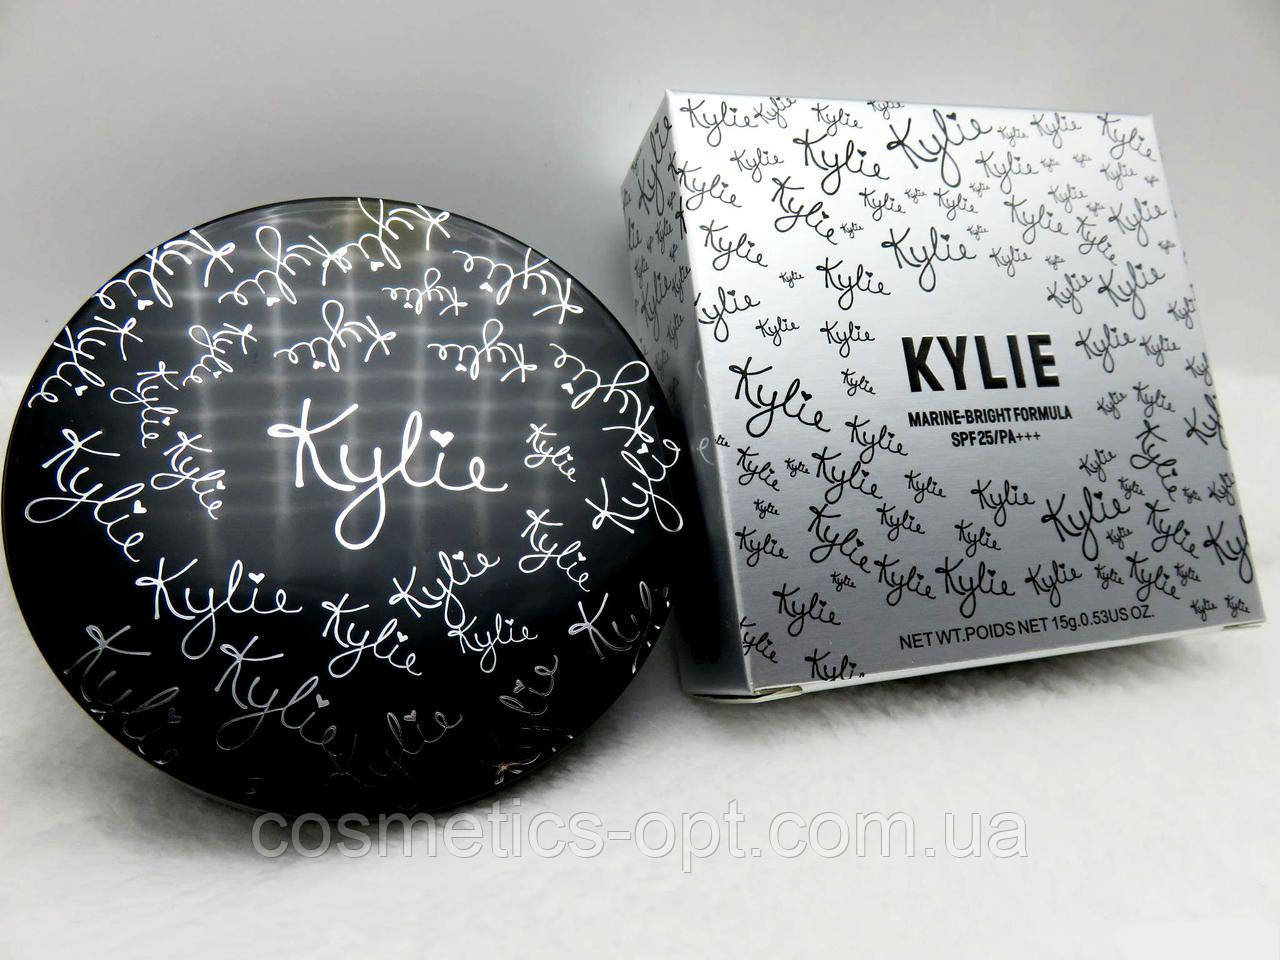 Пудра двойная Kylie Marine-Bright Formula (серебро) (реплика)